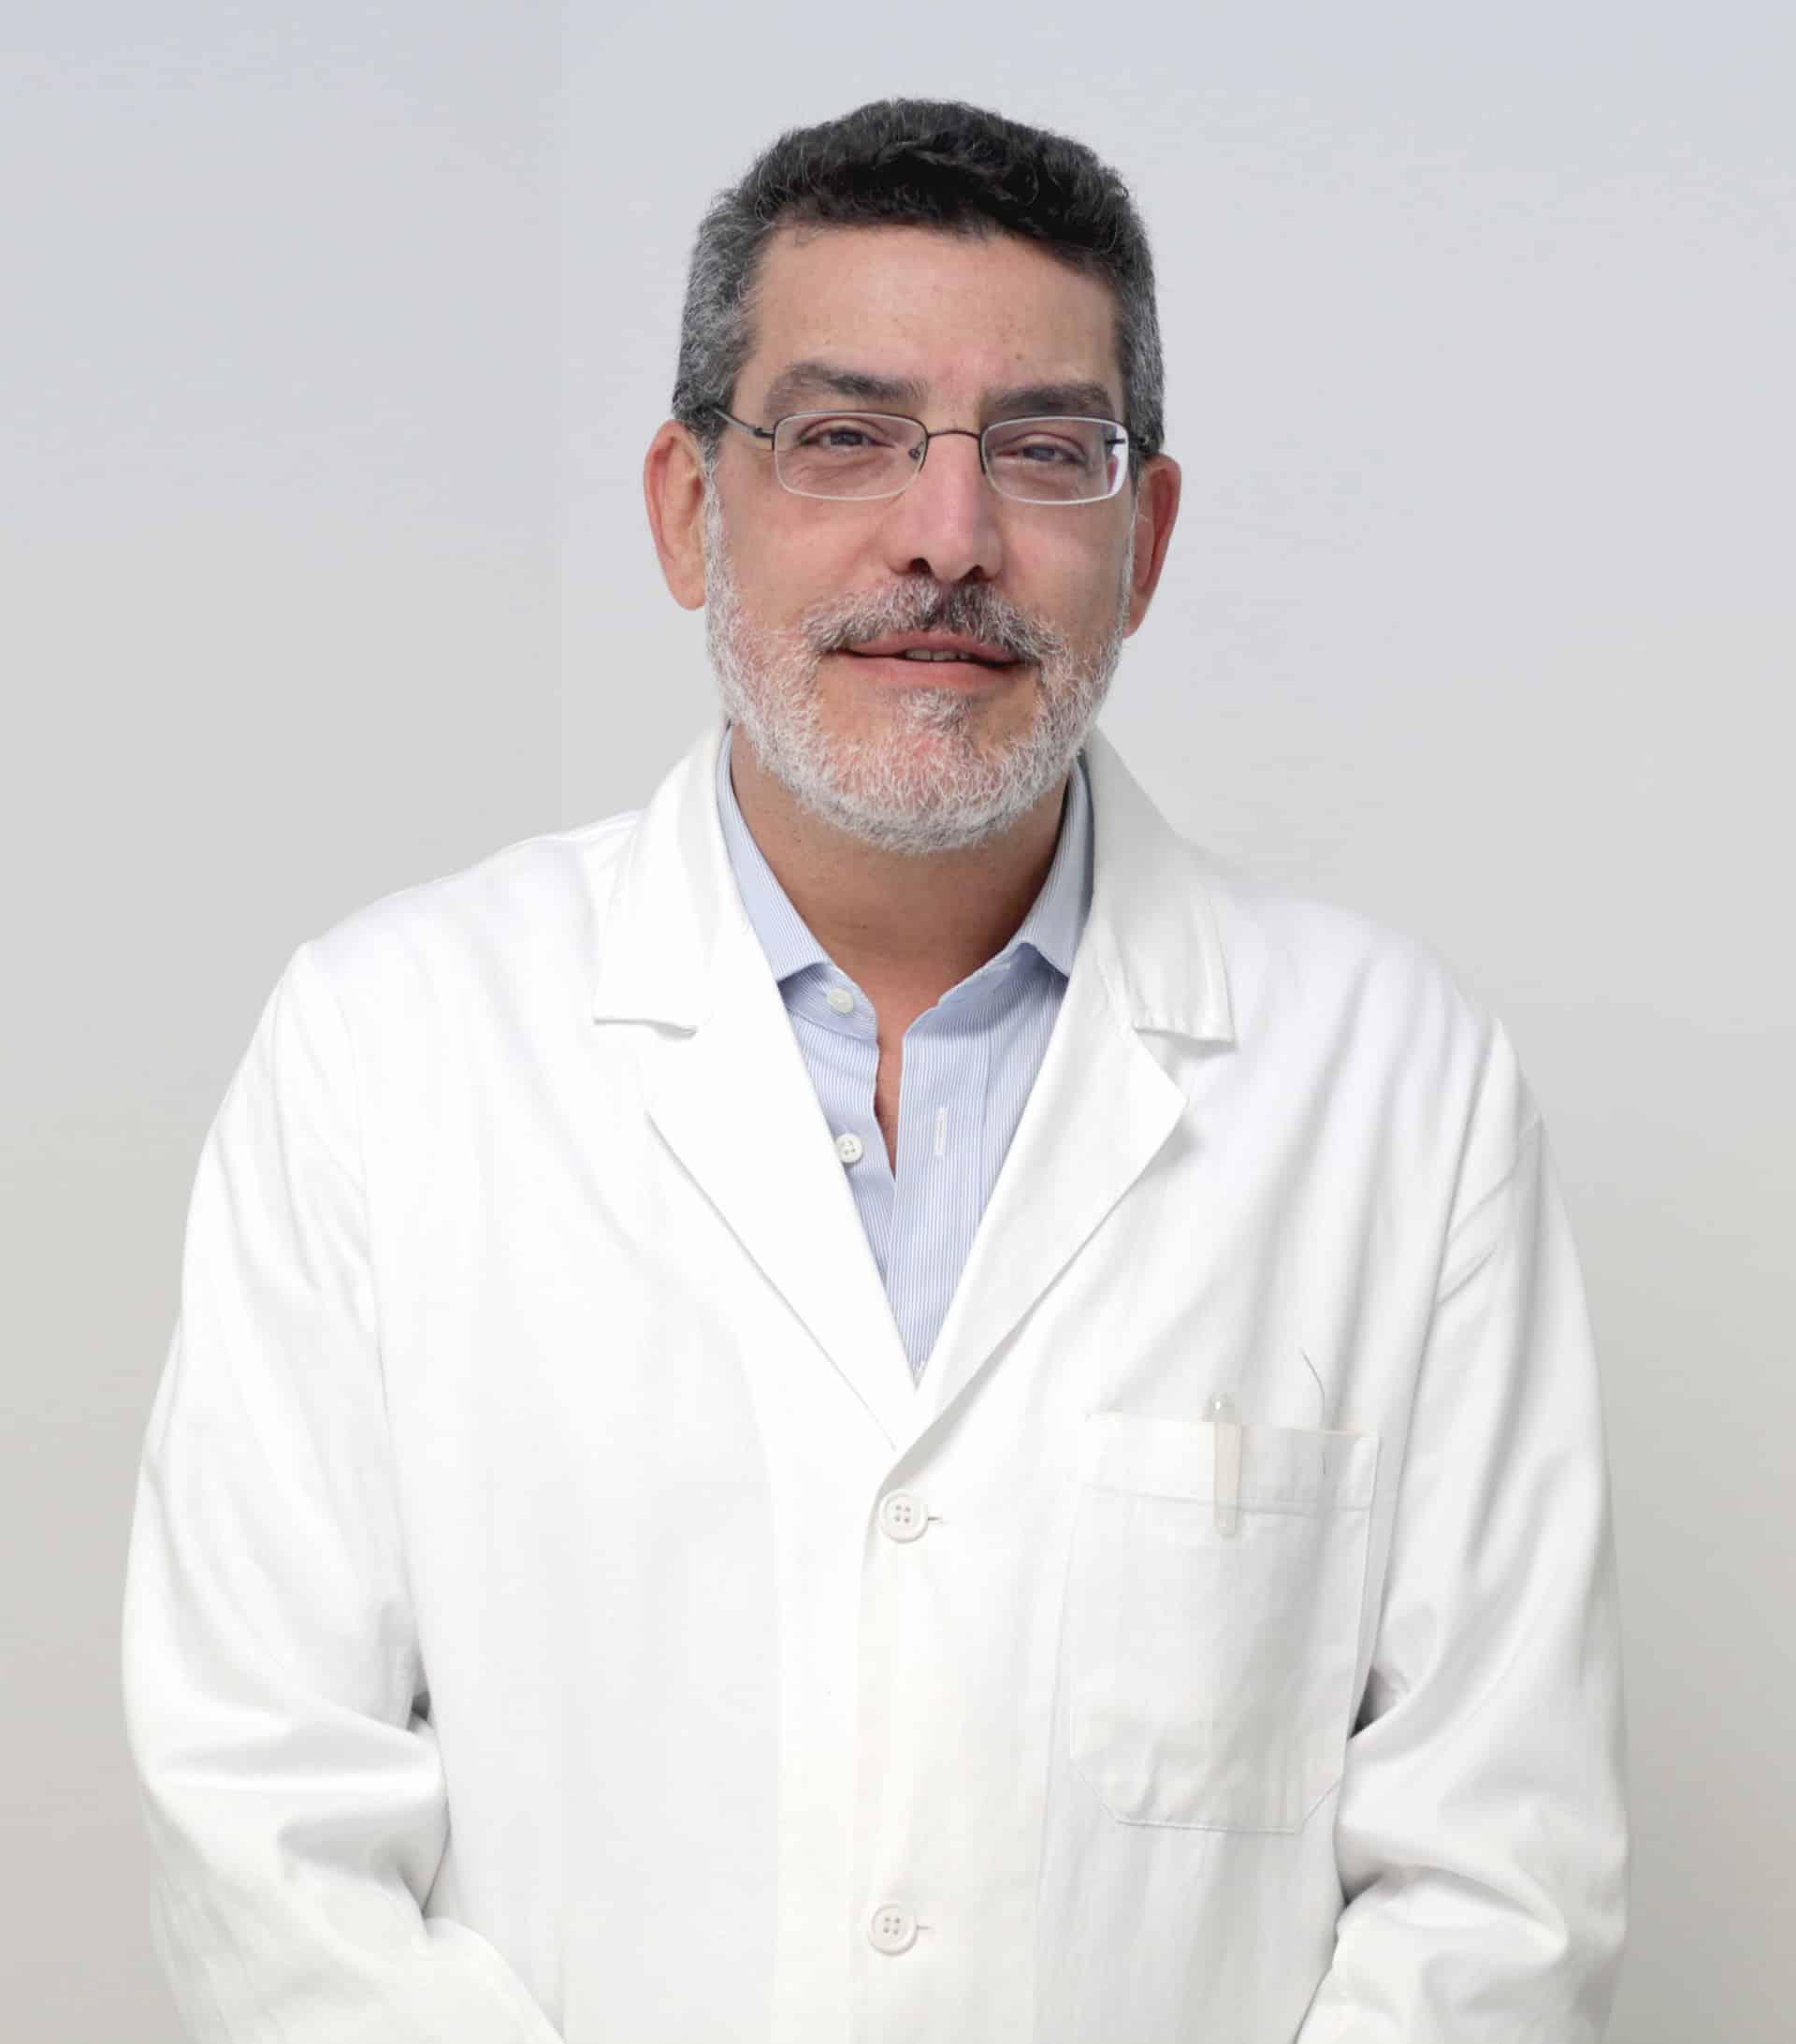 Matteo Libroia